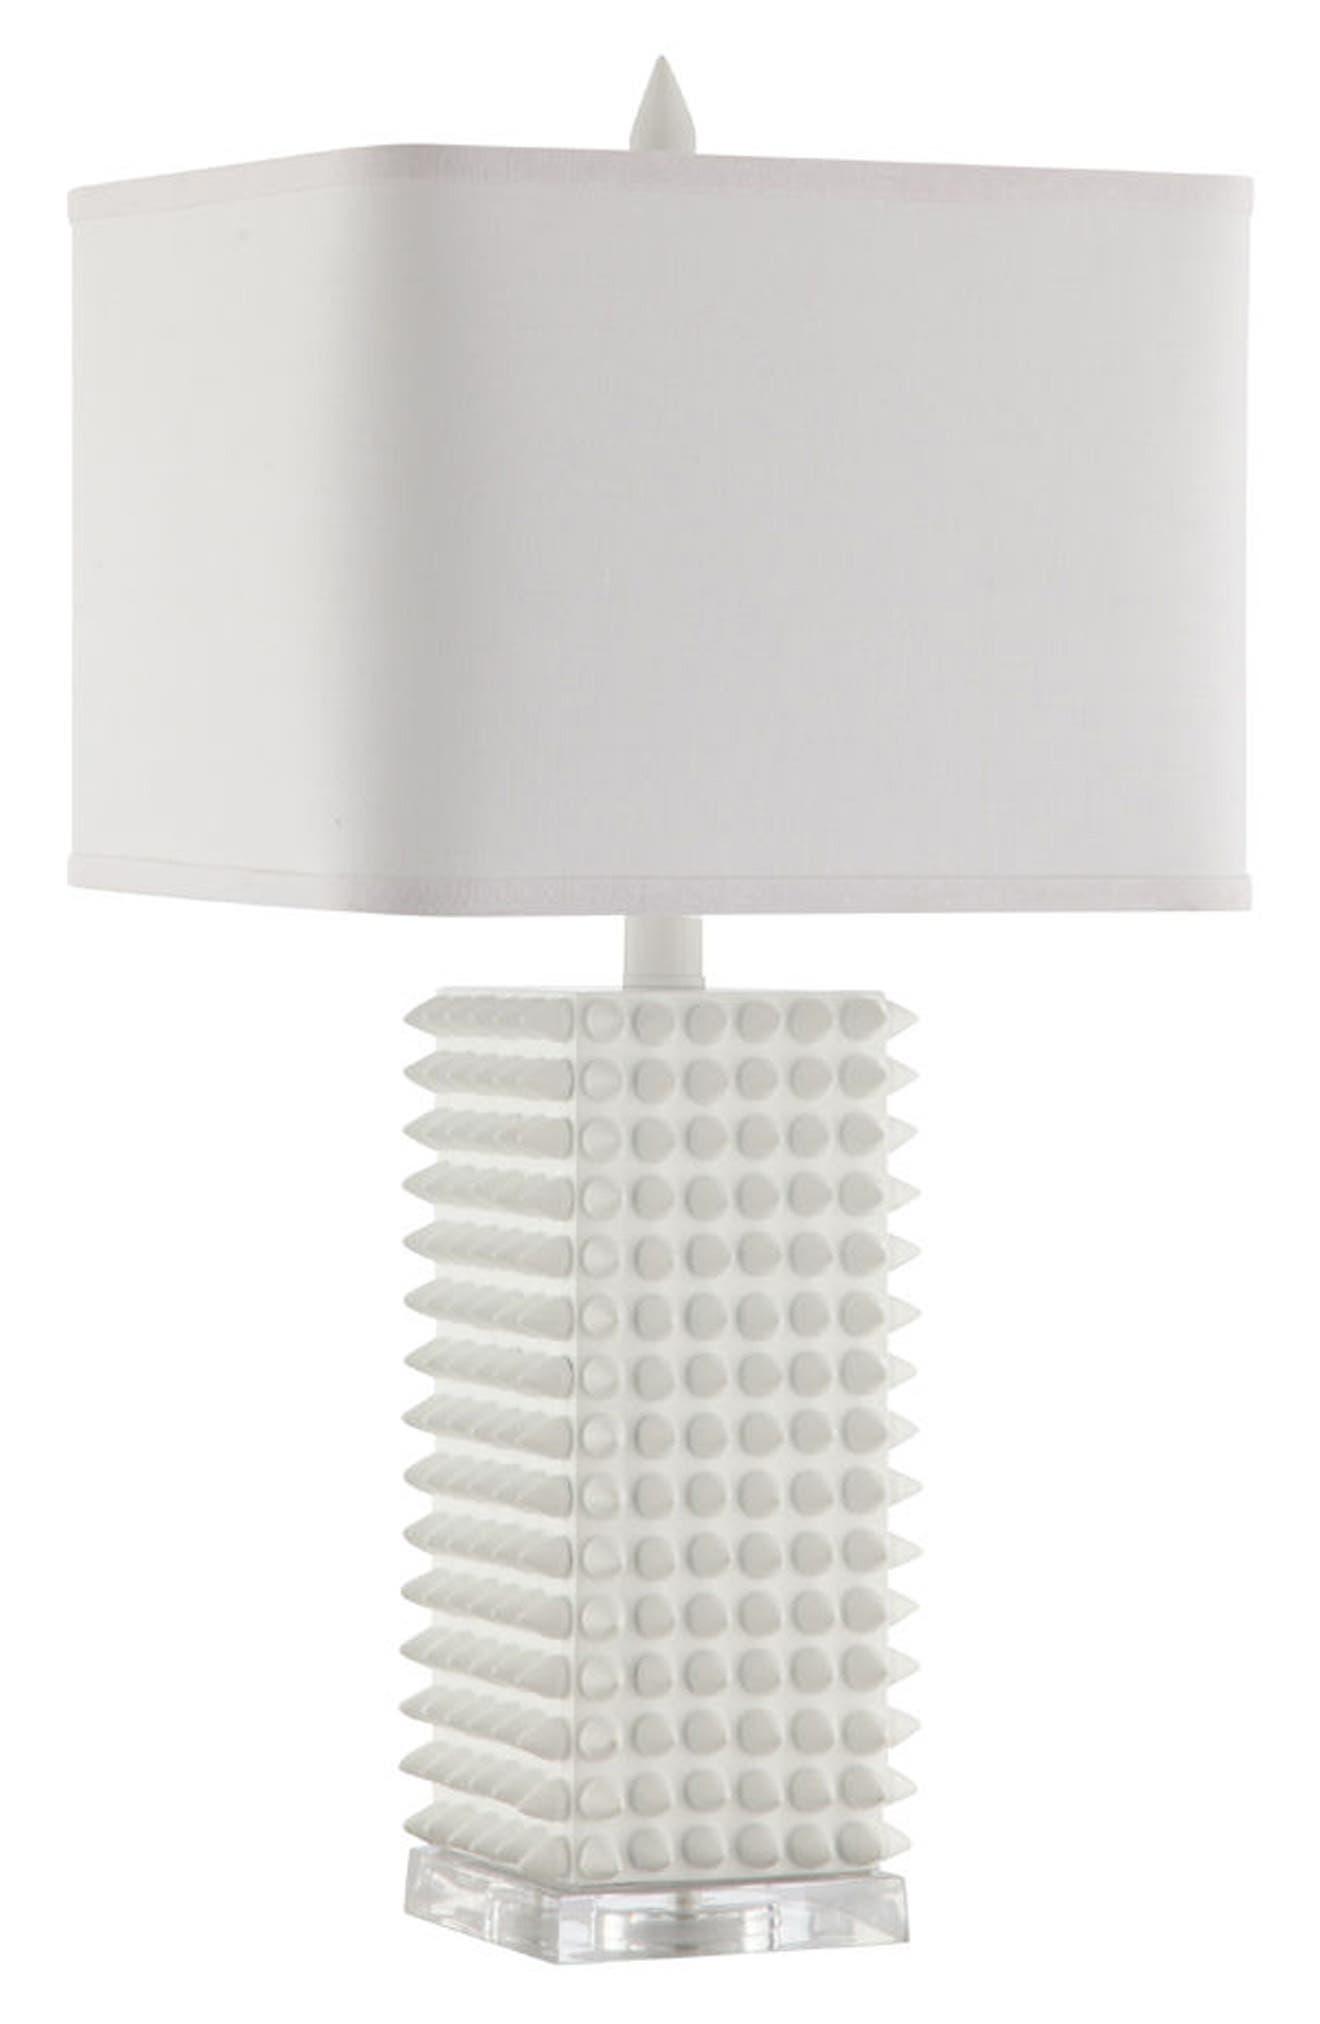 JAlexander Spike Table Lamp,                             Main thumbnail 1, color,                             100